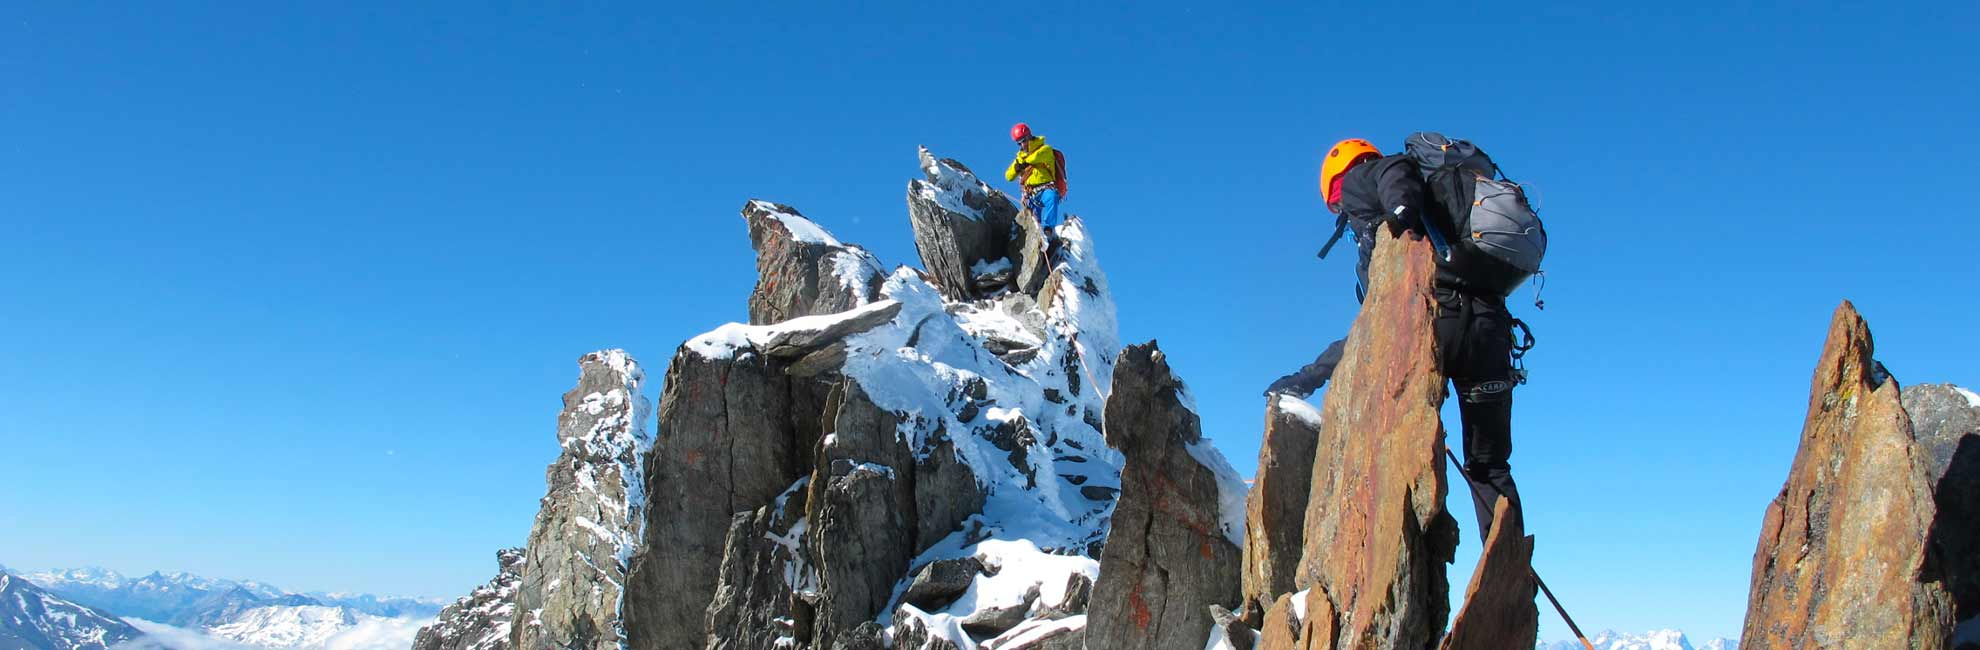 workshop alpinisme hero